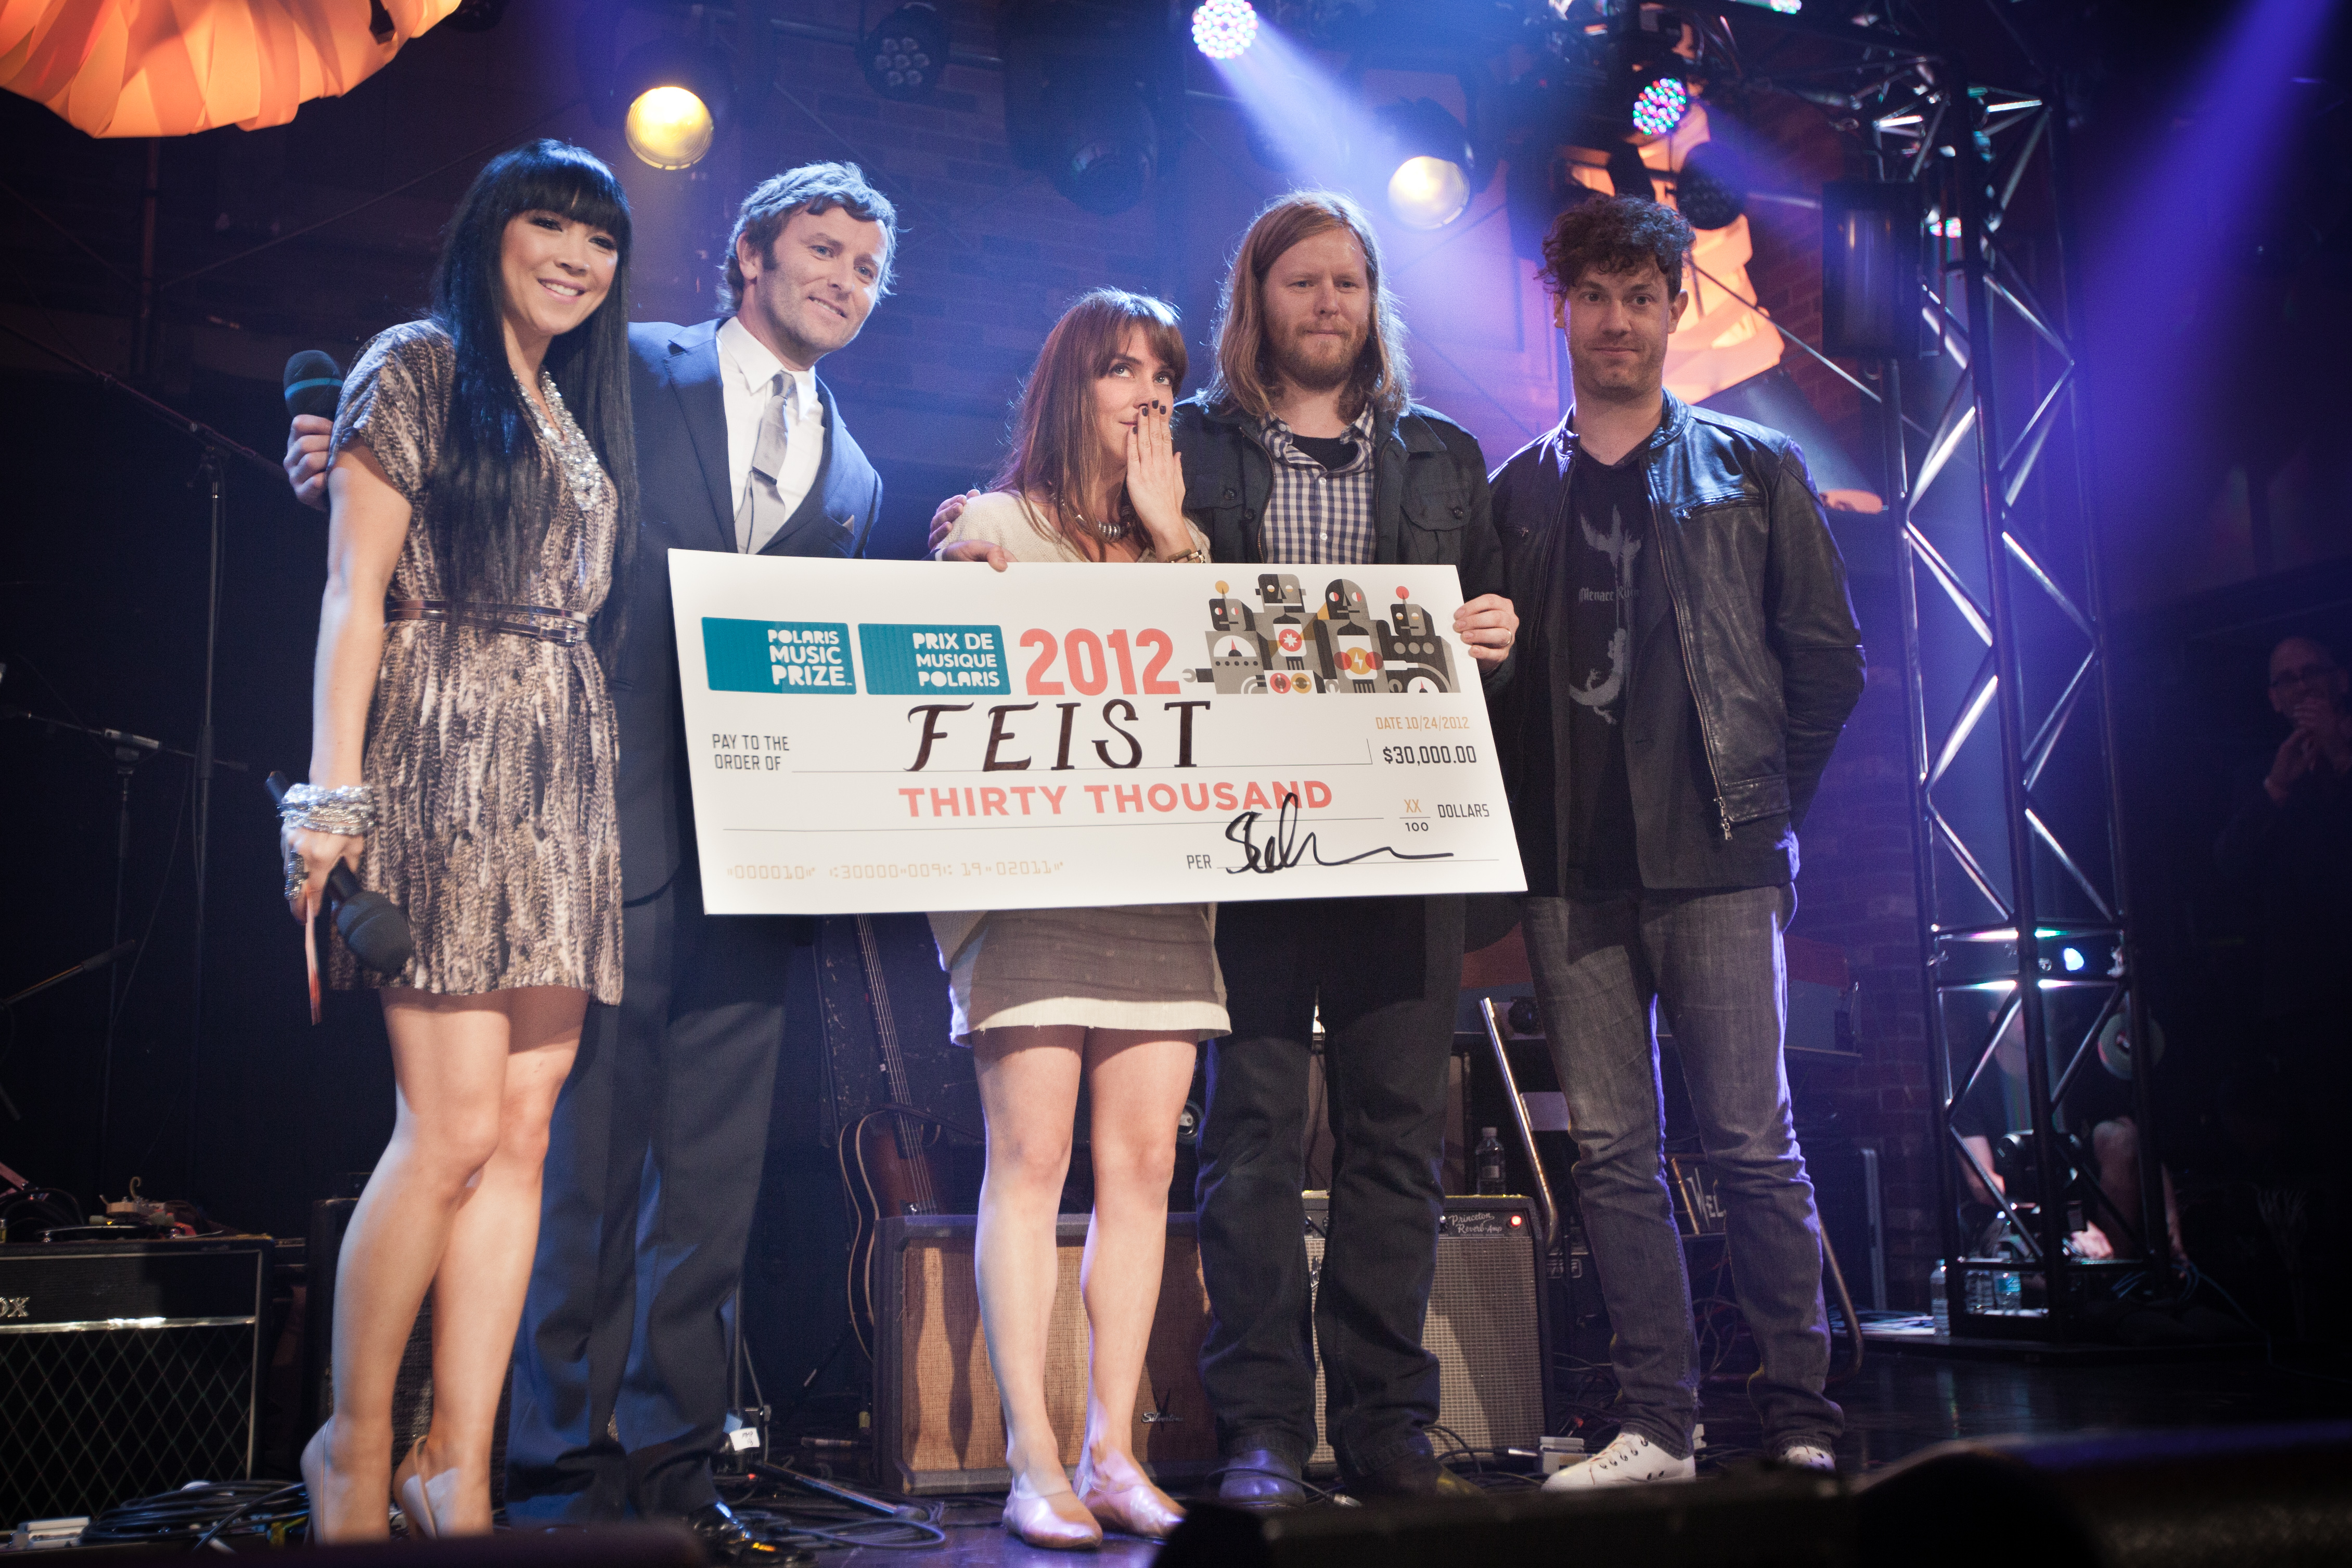 Feist Wins 2012 Polaris Music Prize for <i>Metals</i>